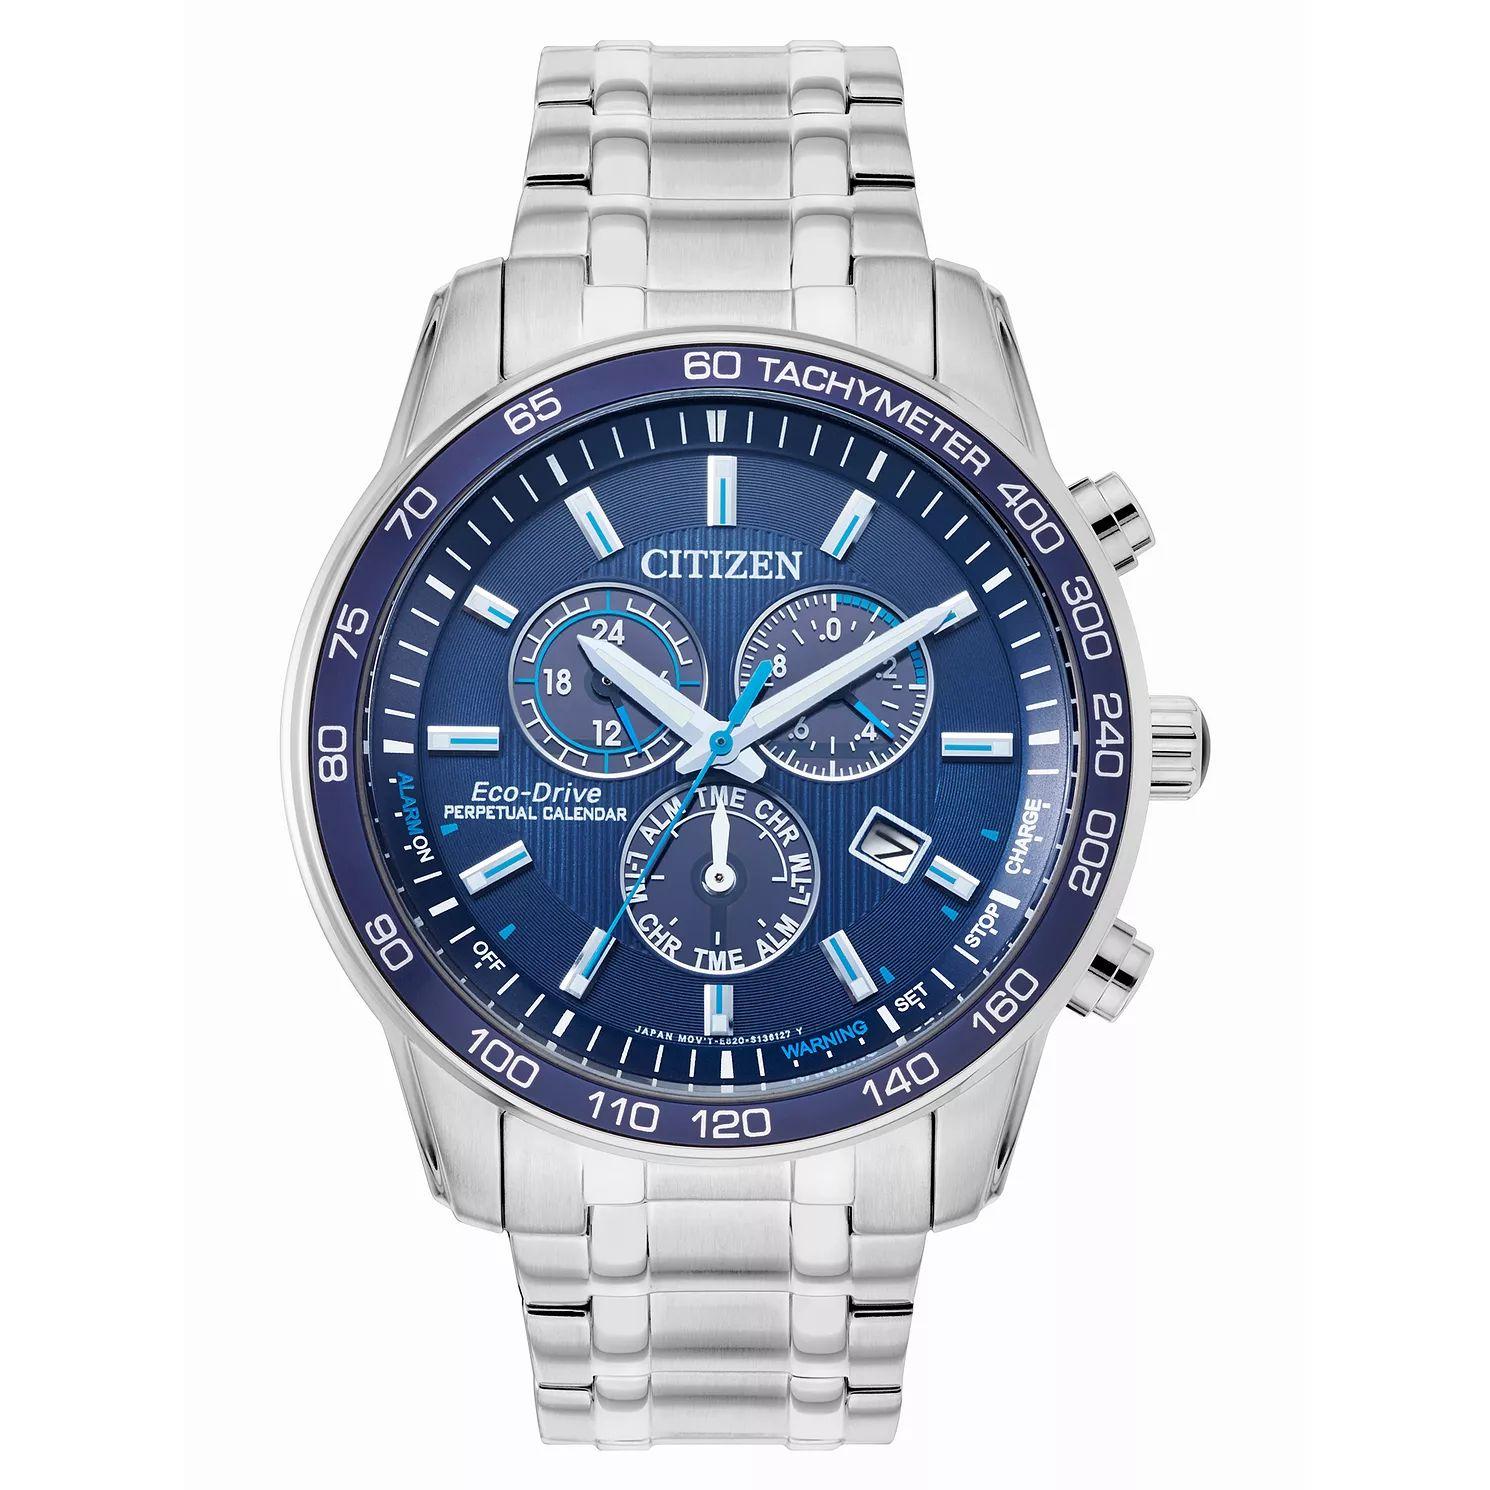 Citizen Eco-Drive Perpetual Calendar Men's Bracelet Watch £169.99 @ H samuel